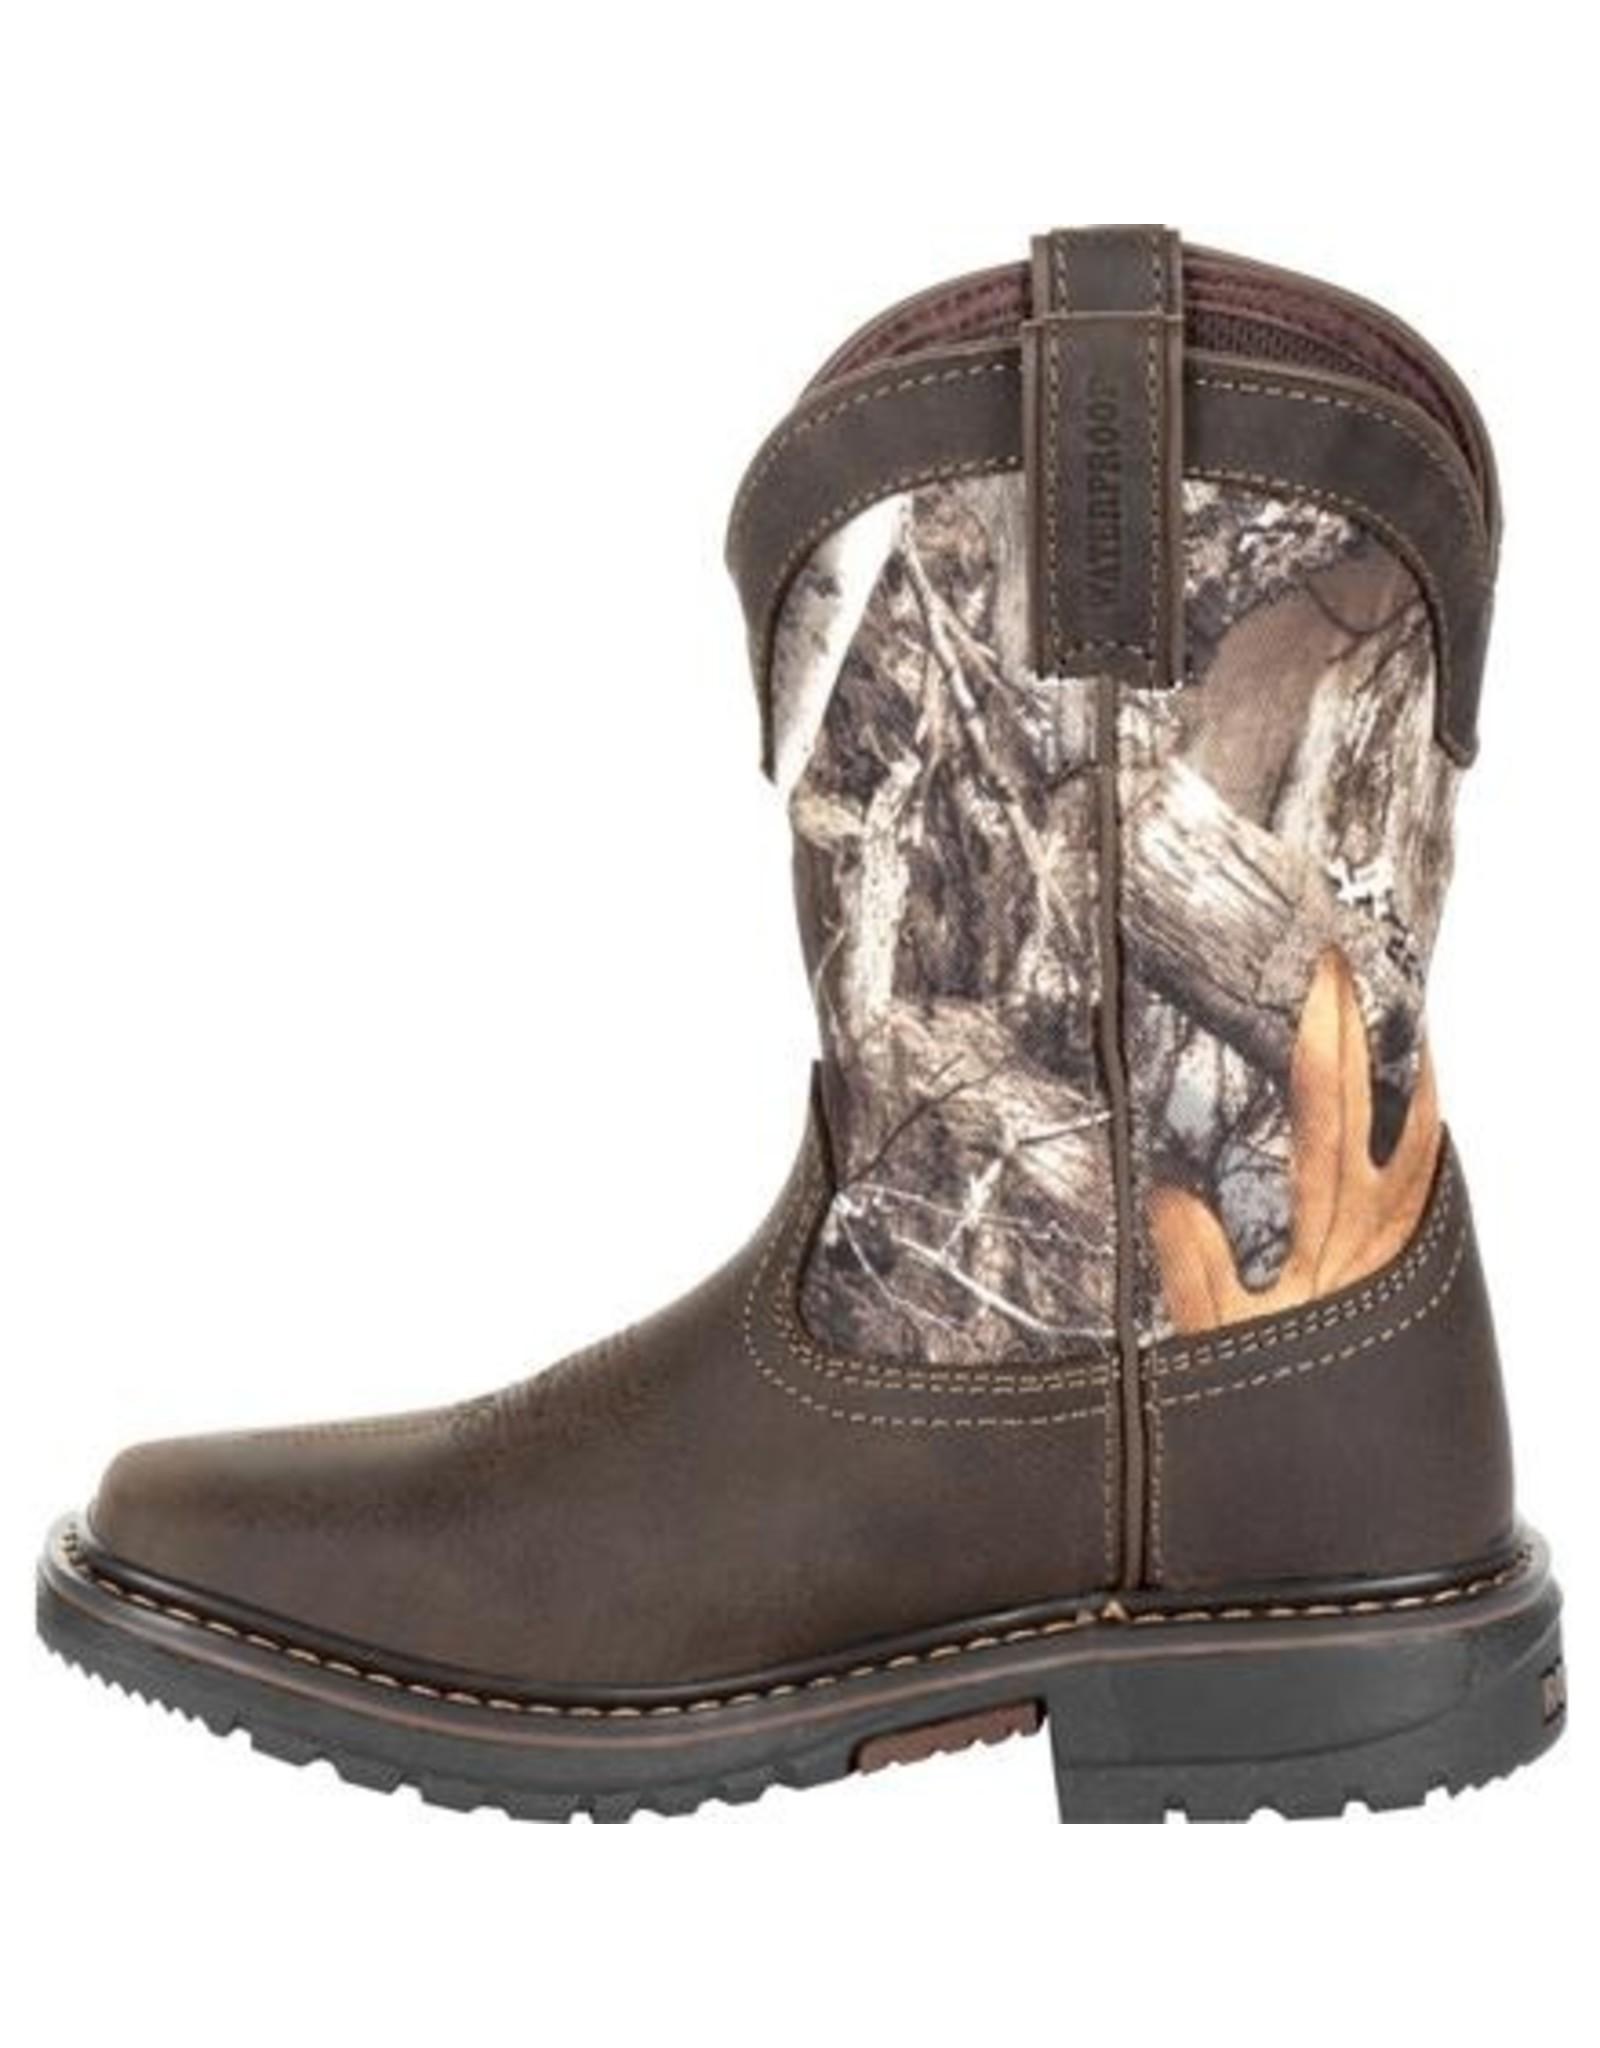 Boots-Children Rocky RKW0258Y Realtree Original Ride Flx